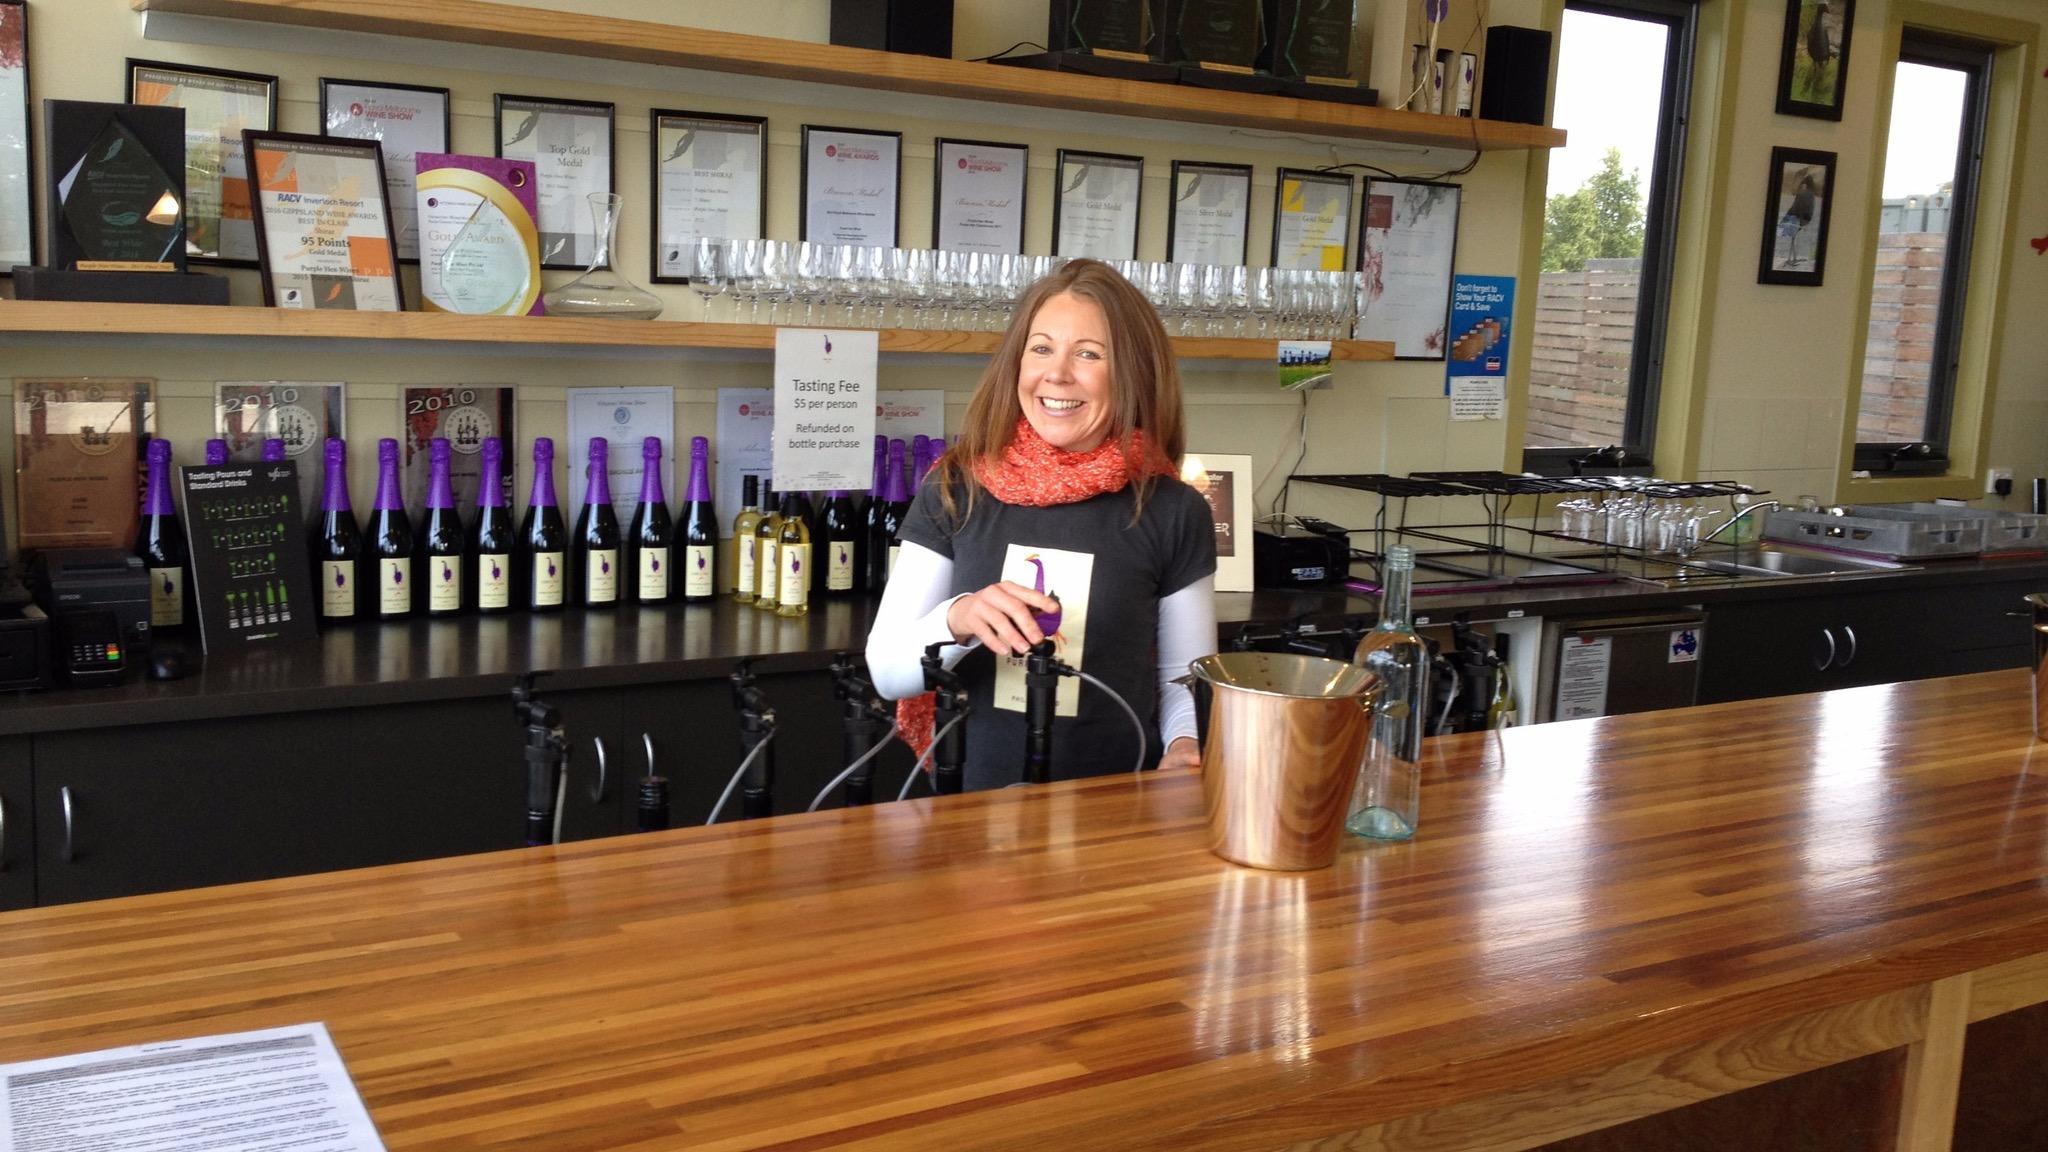 Image of wine tasting area at Purple Hen Winery